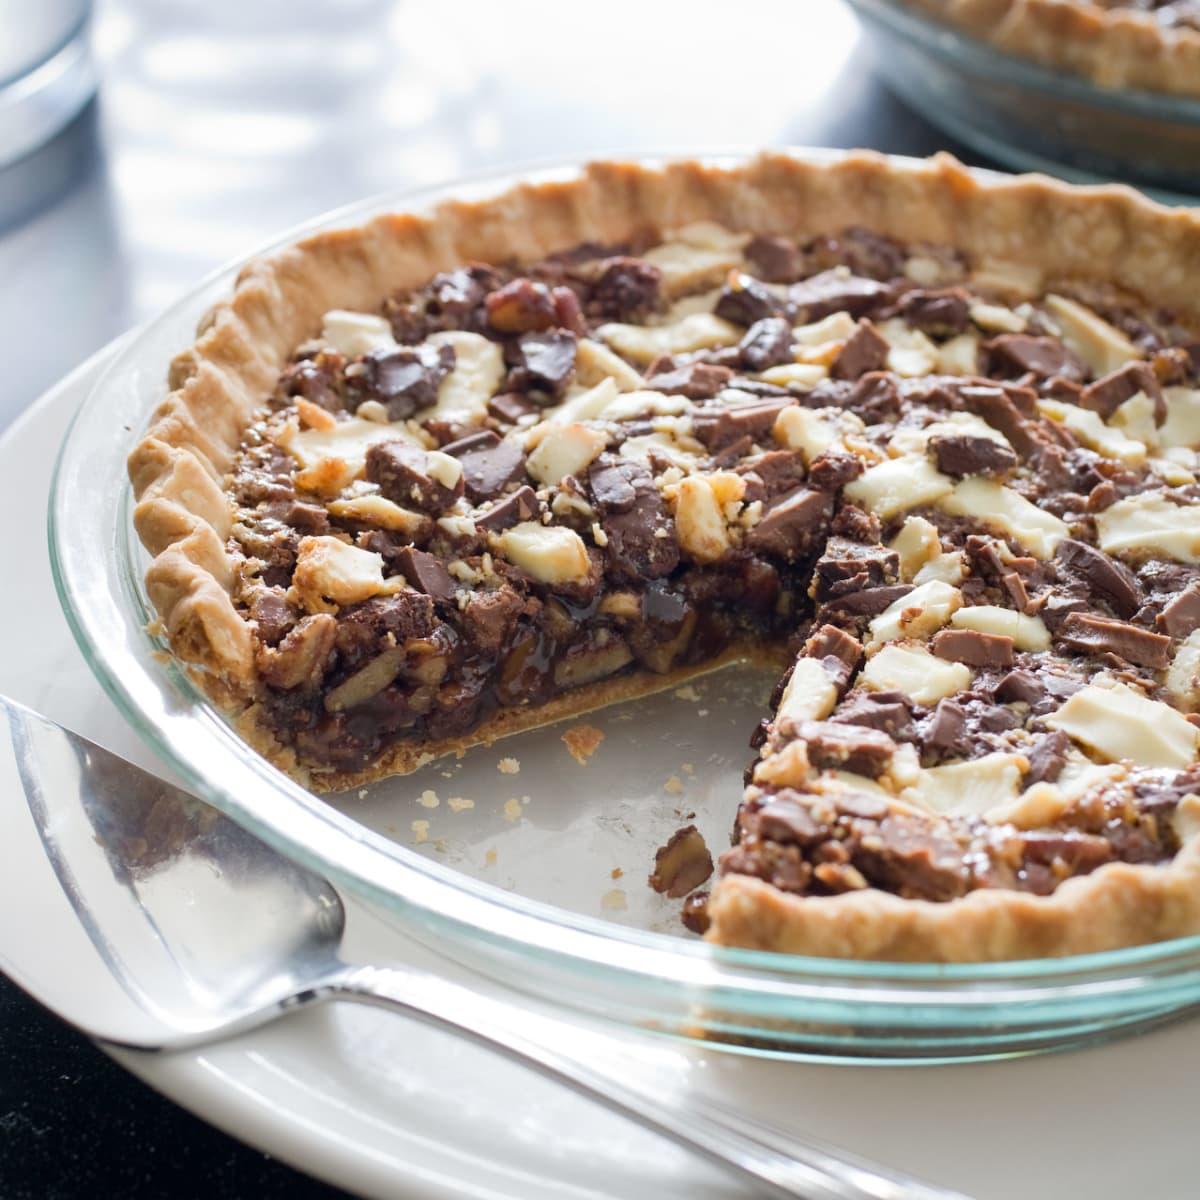 Watch Chocolate Chunk Pecan Pie video